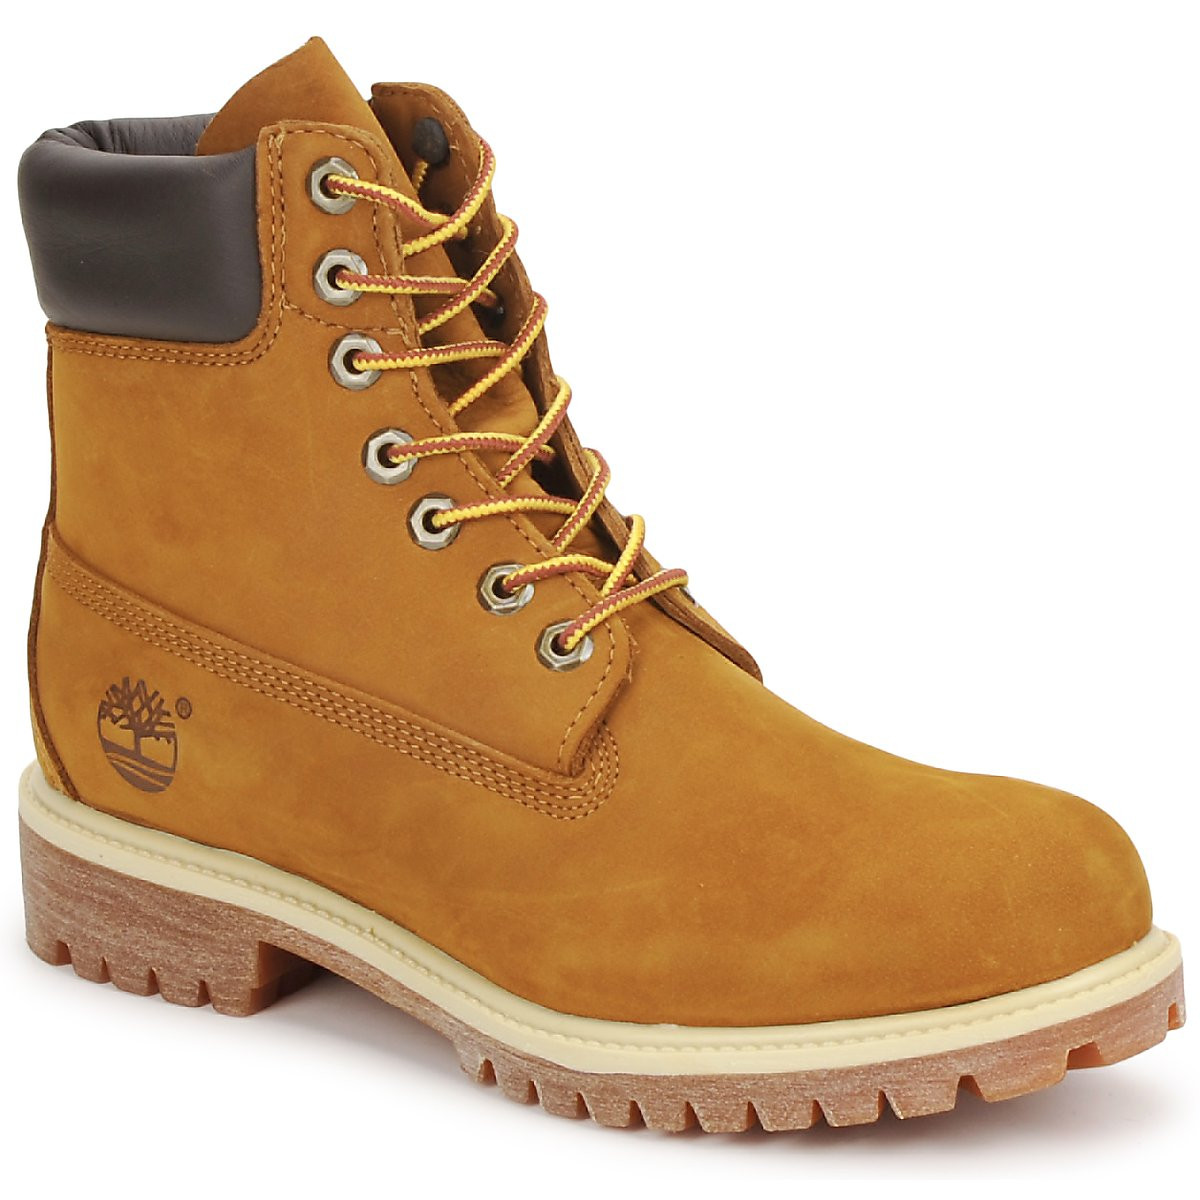 HommeElles Porter Chaussure Confortables Timberland Sont À EIH2WDY9